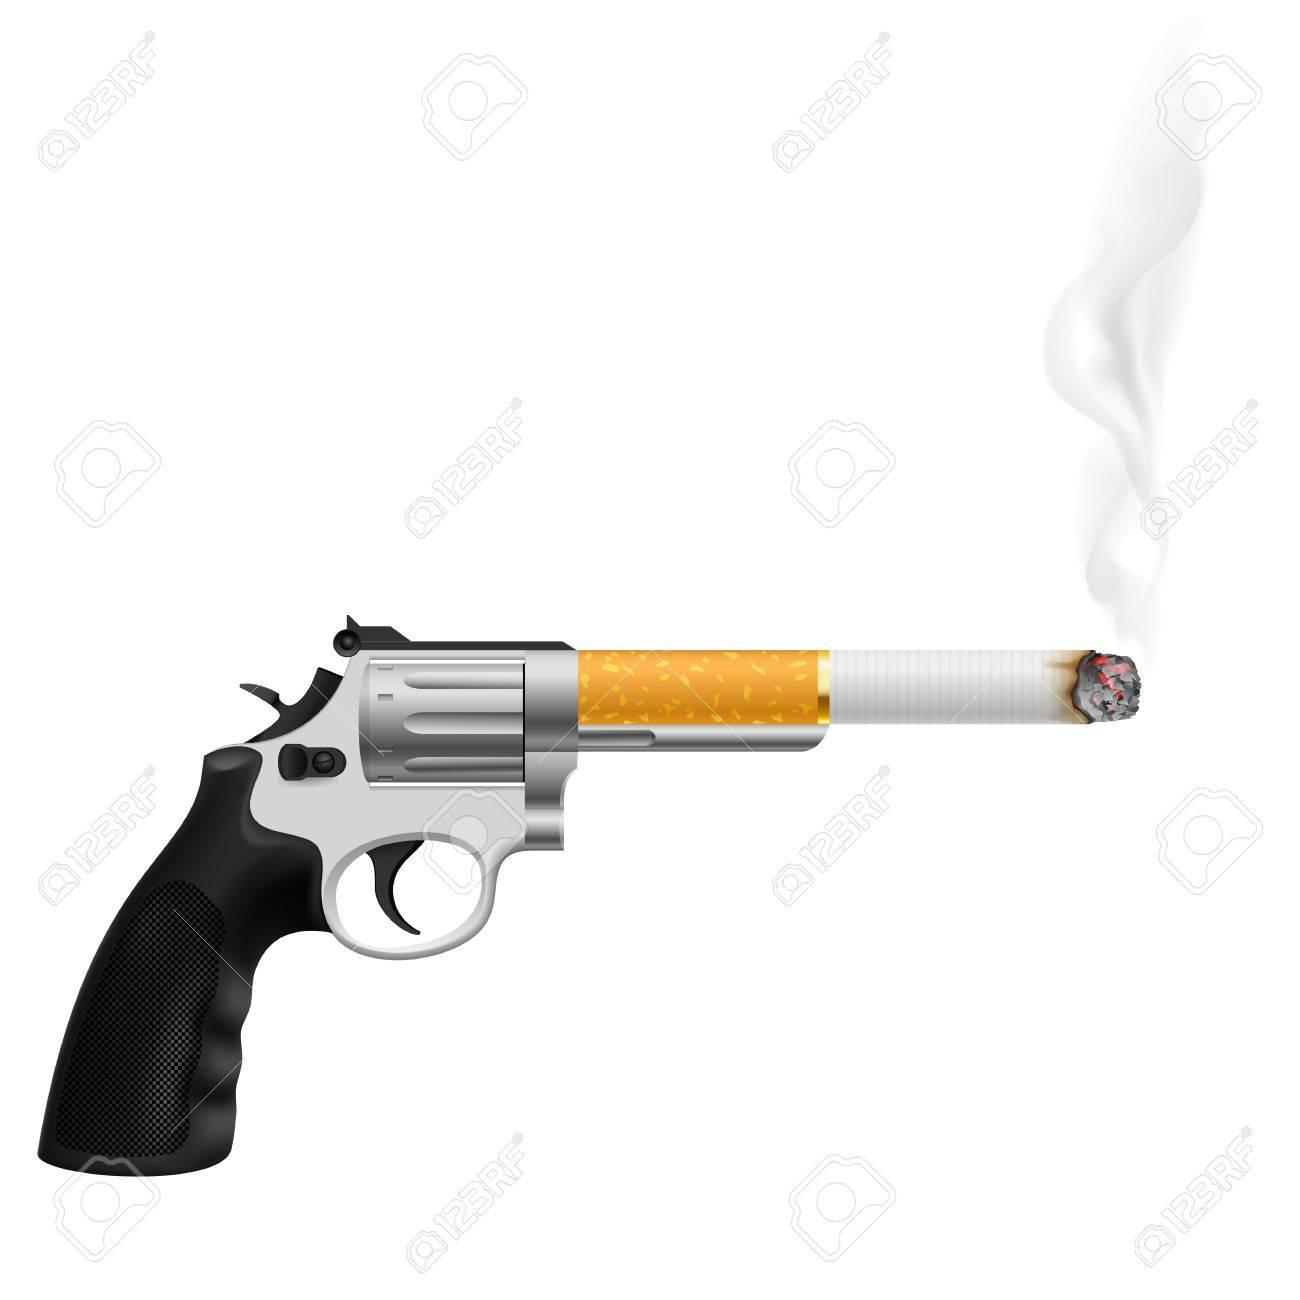 Revolver with a cigarette. Illustration on white Stock Vector - 16954688